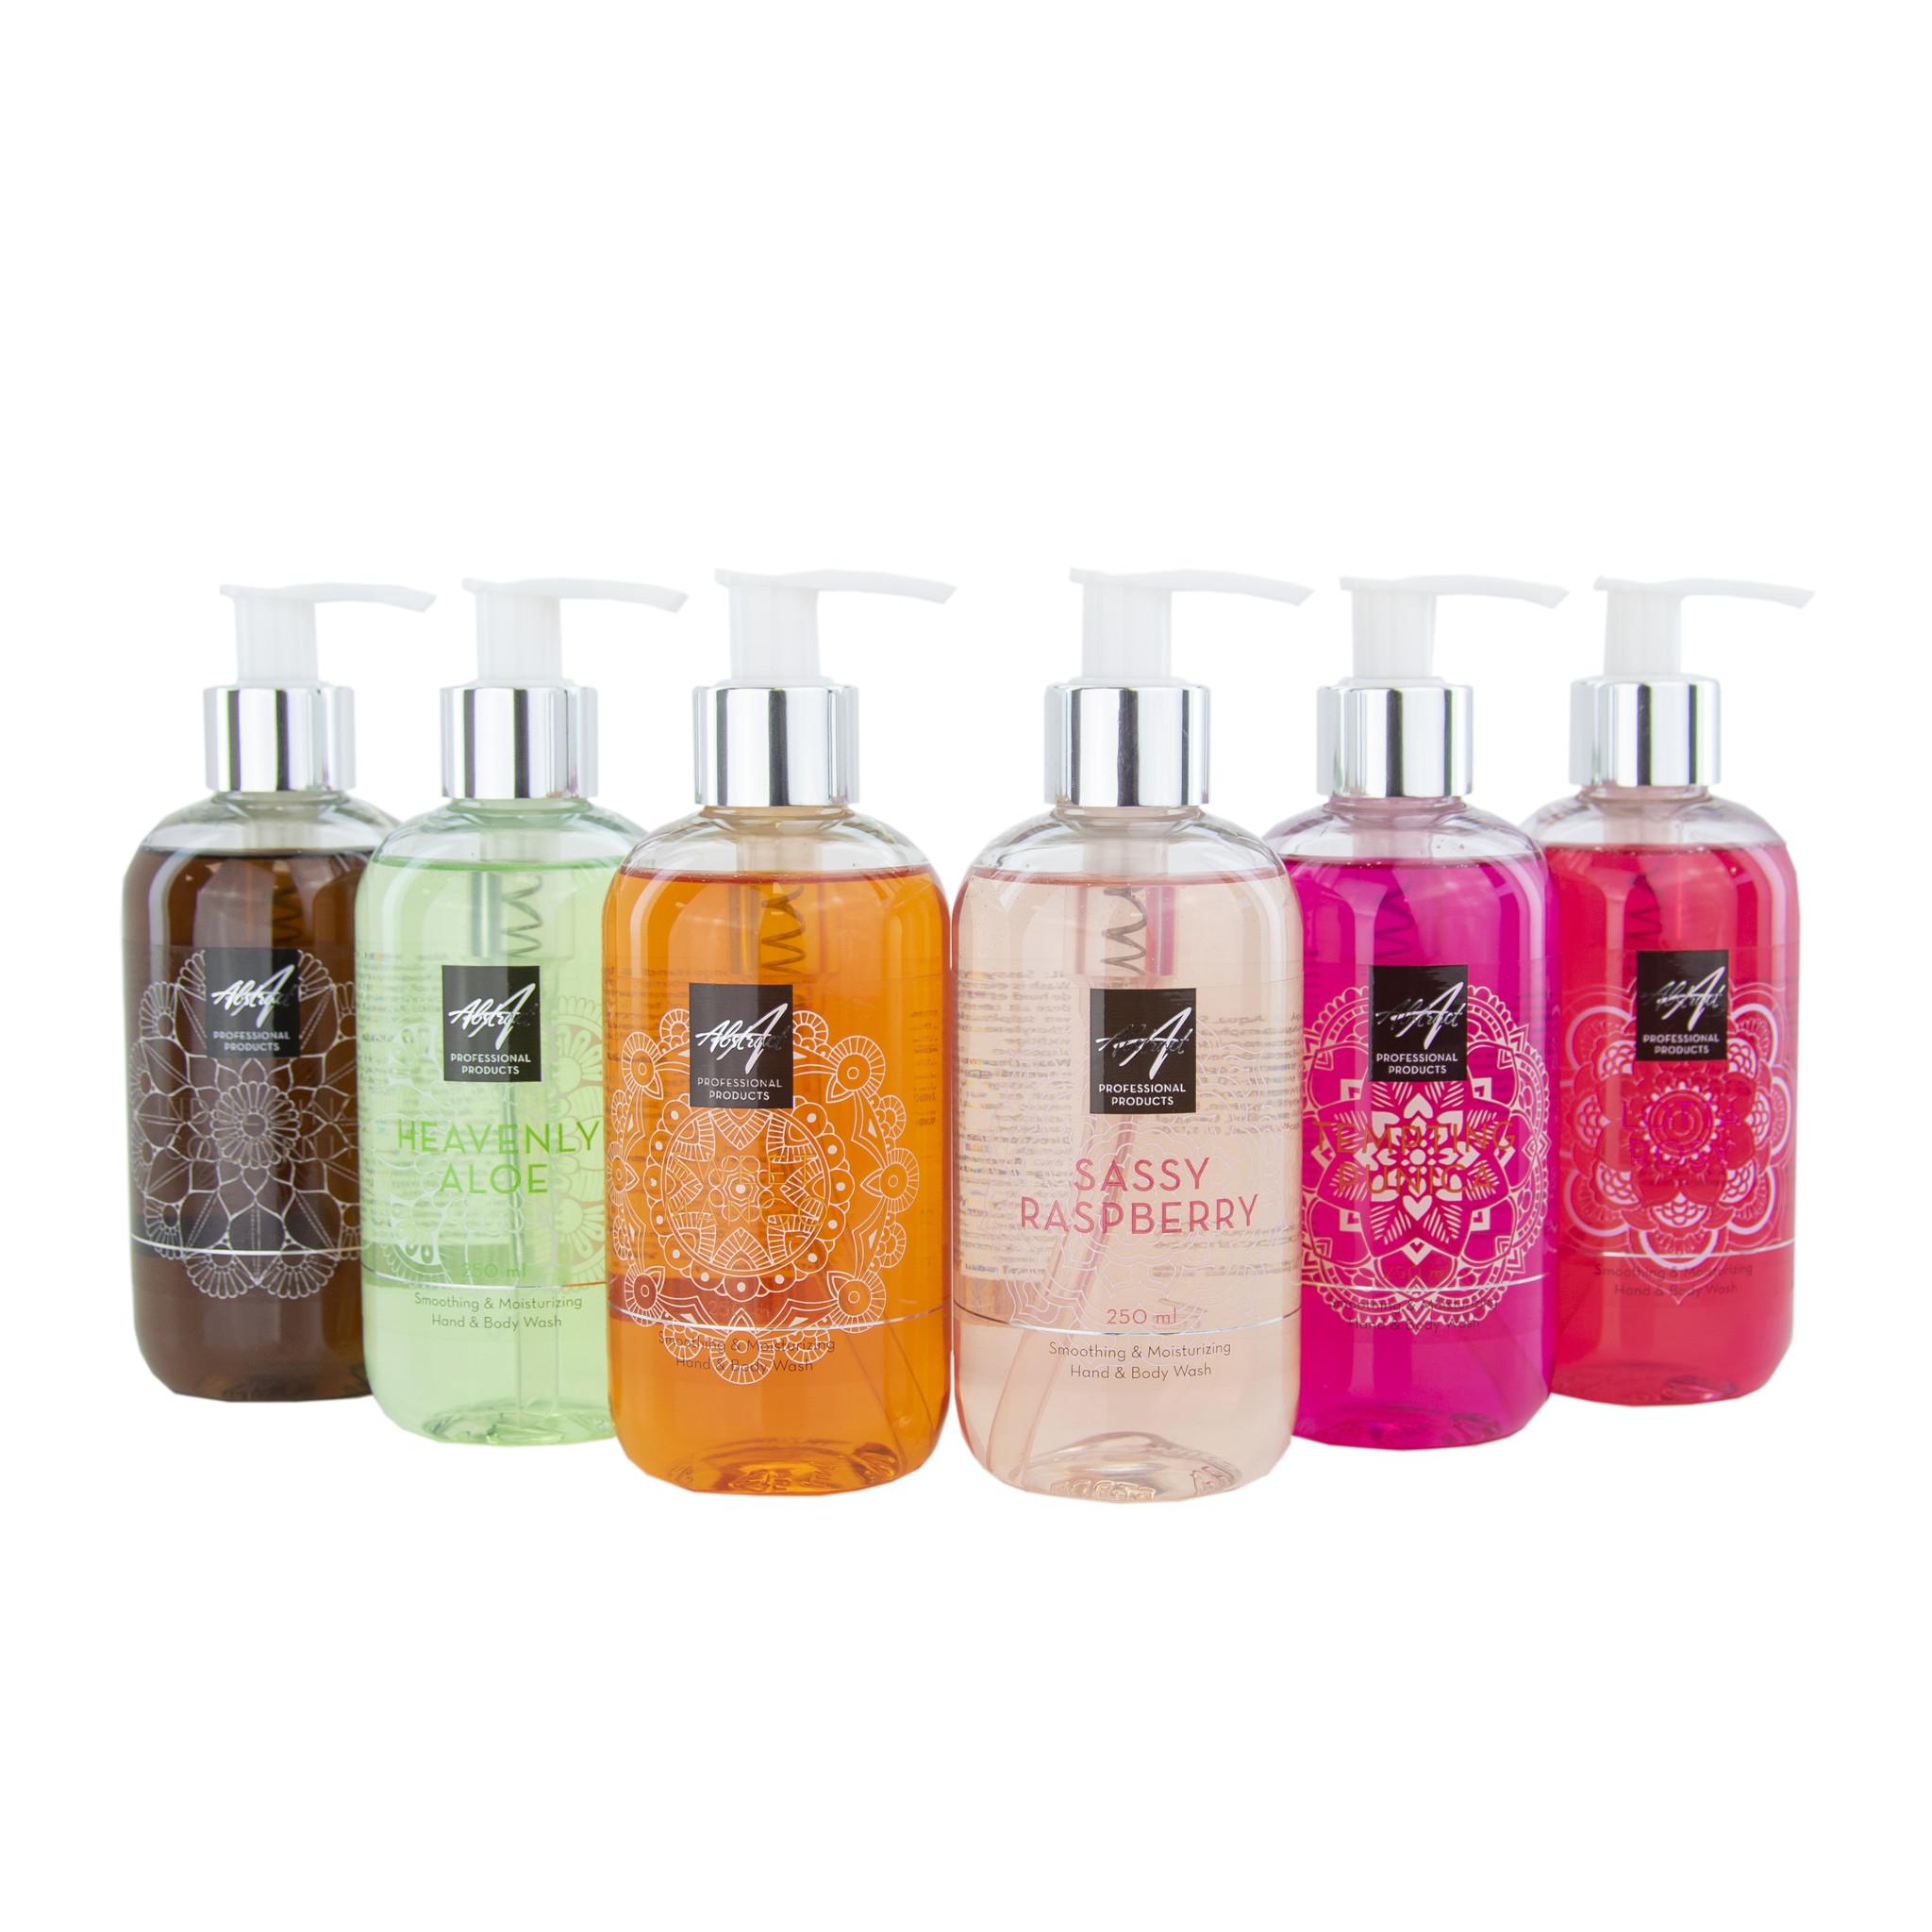 Abstract Hand & Body Soap - Sassy Raspberry 250 ml